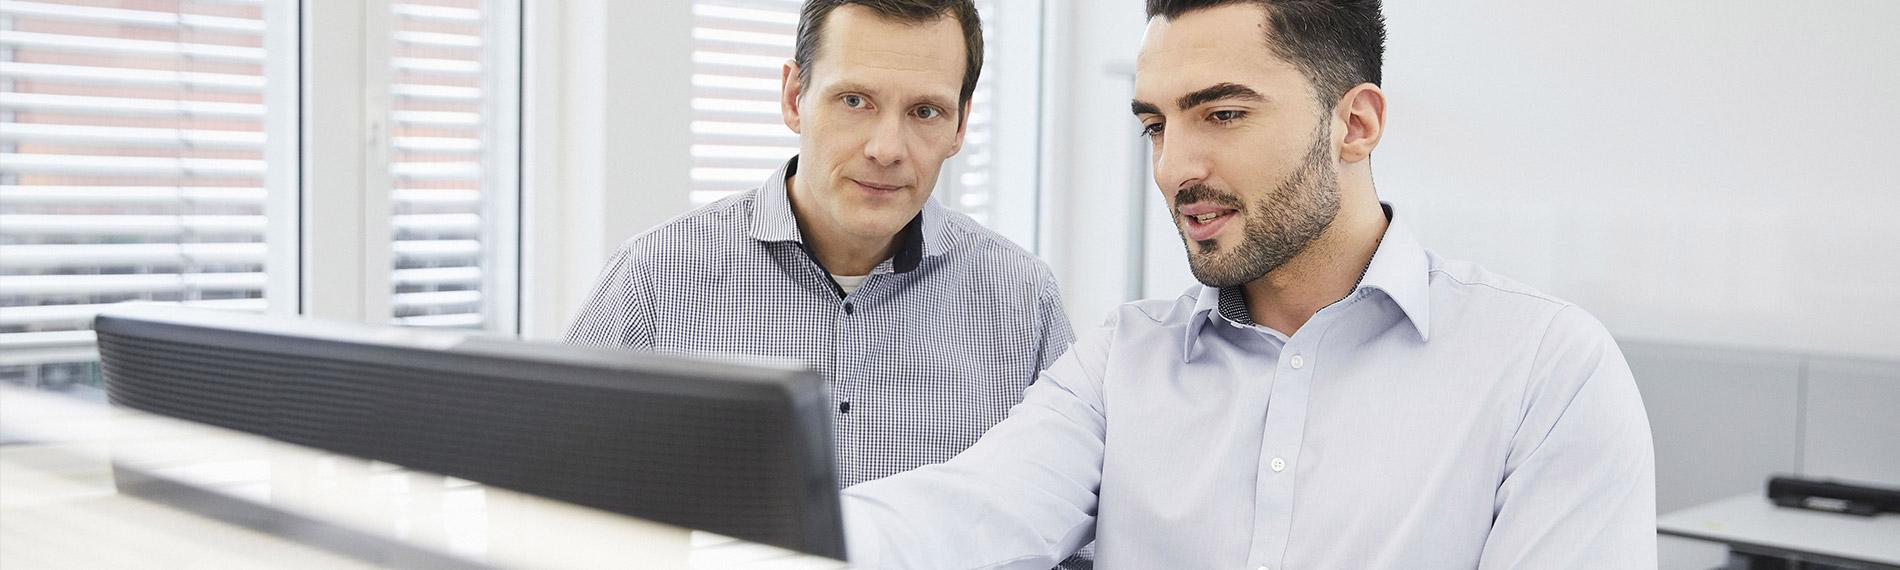 header desktop verkaeufer erklaert kunden etwas am computer